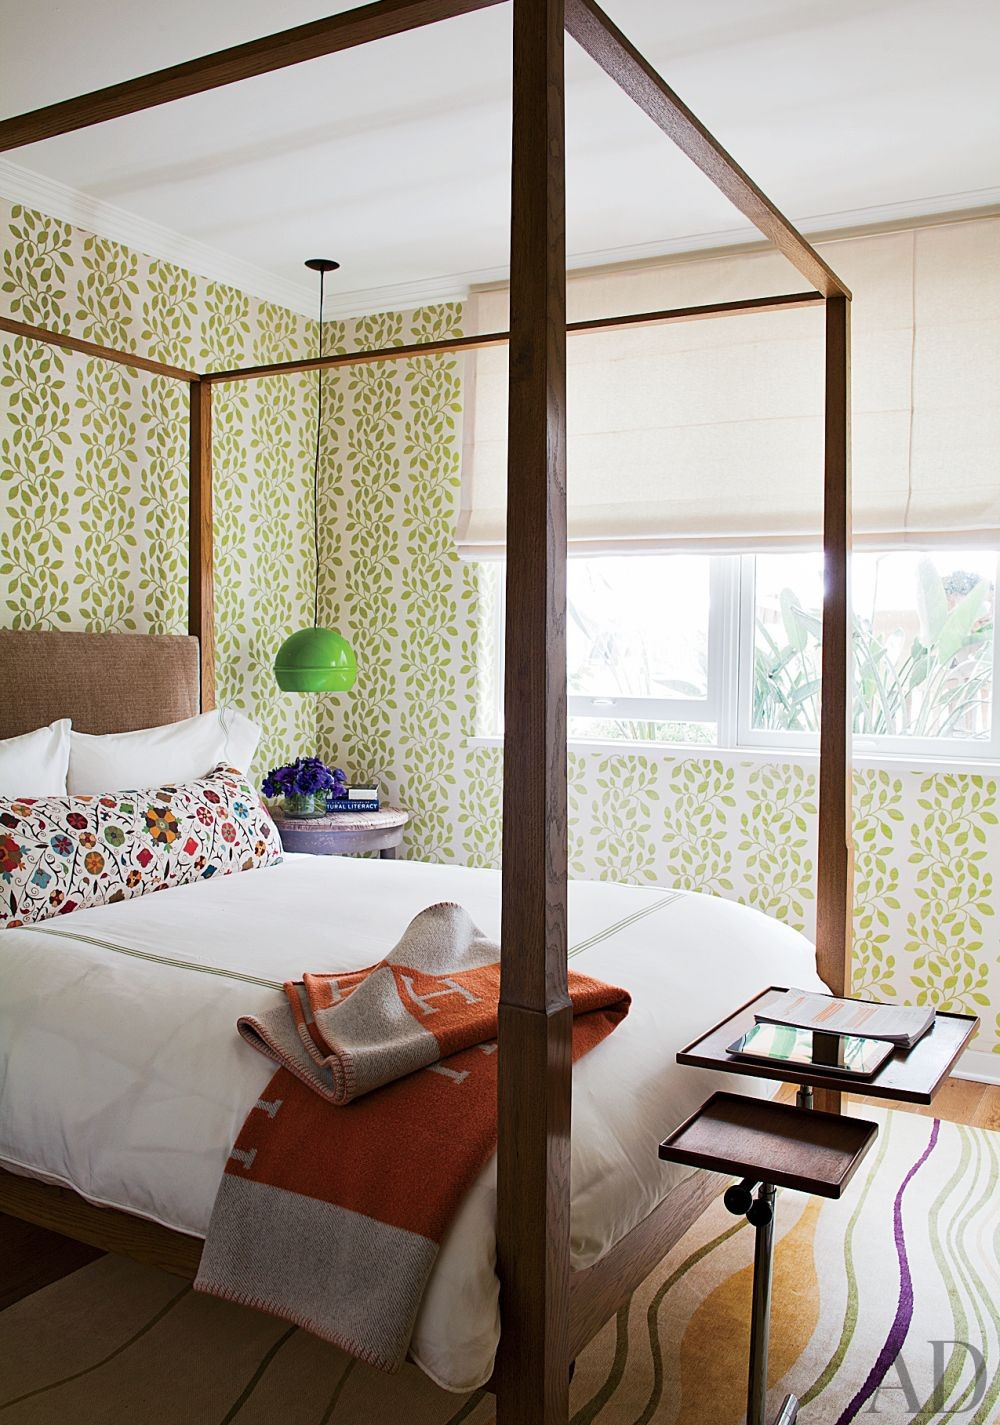 Contemporary Bedroom by Trip Haenisch & Associates in Bel Air, California